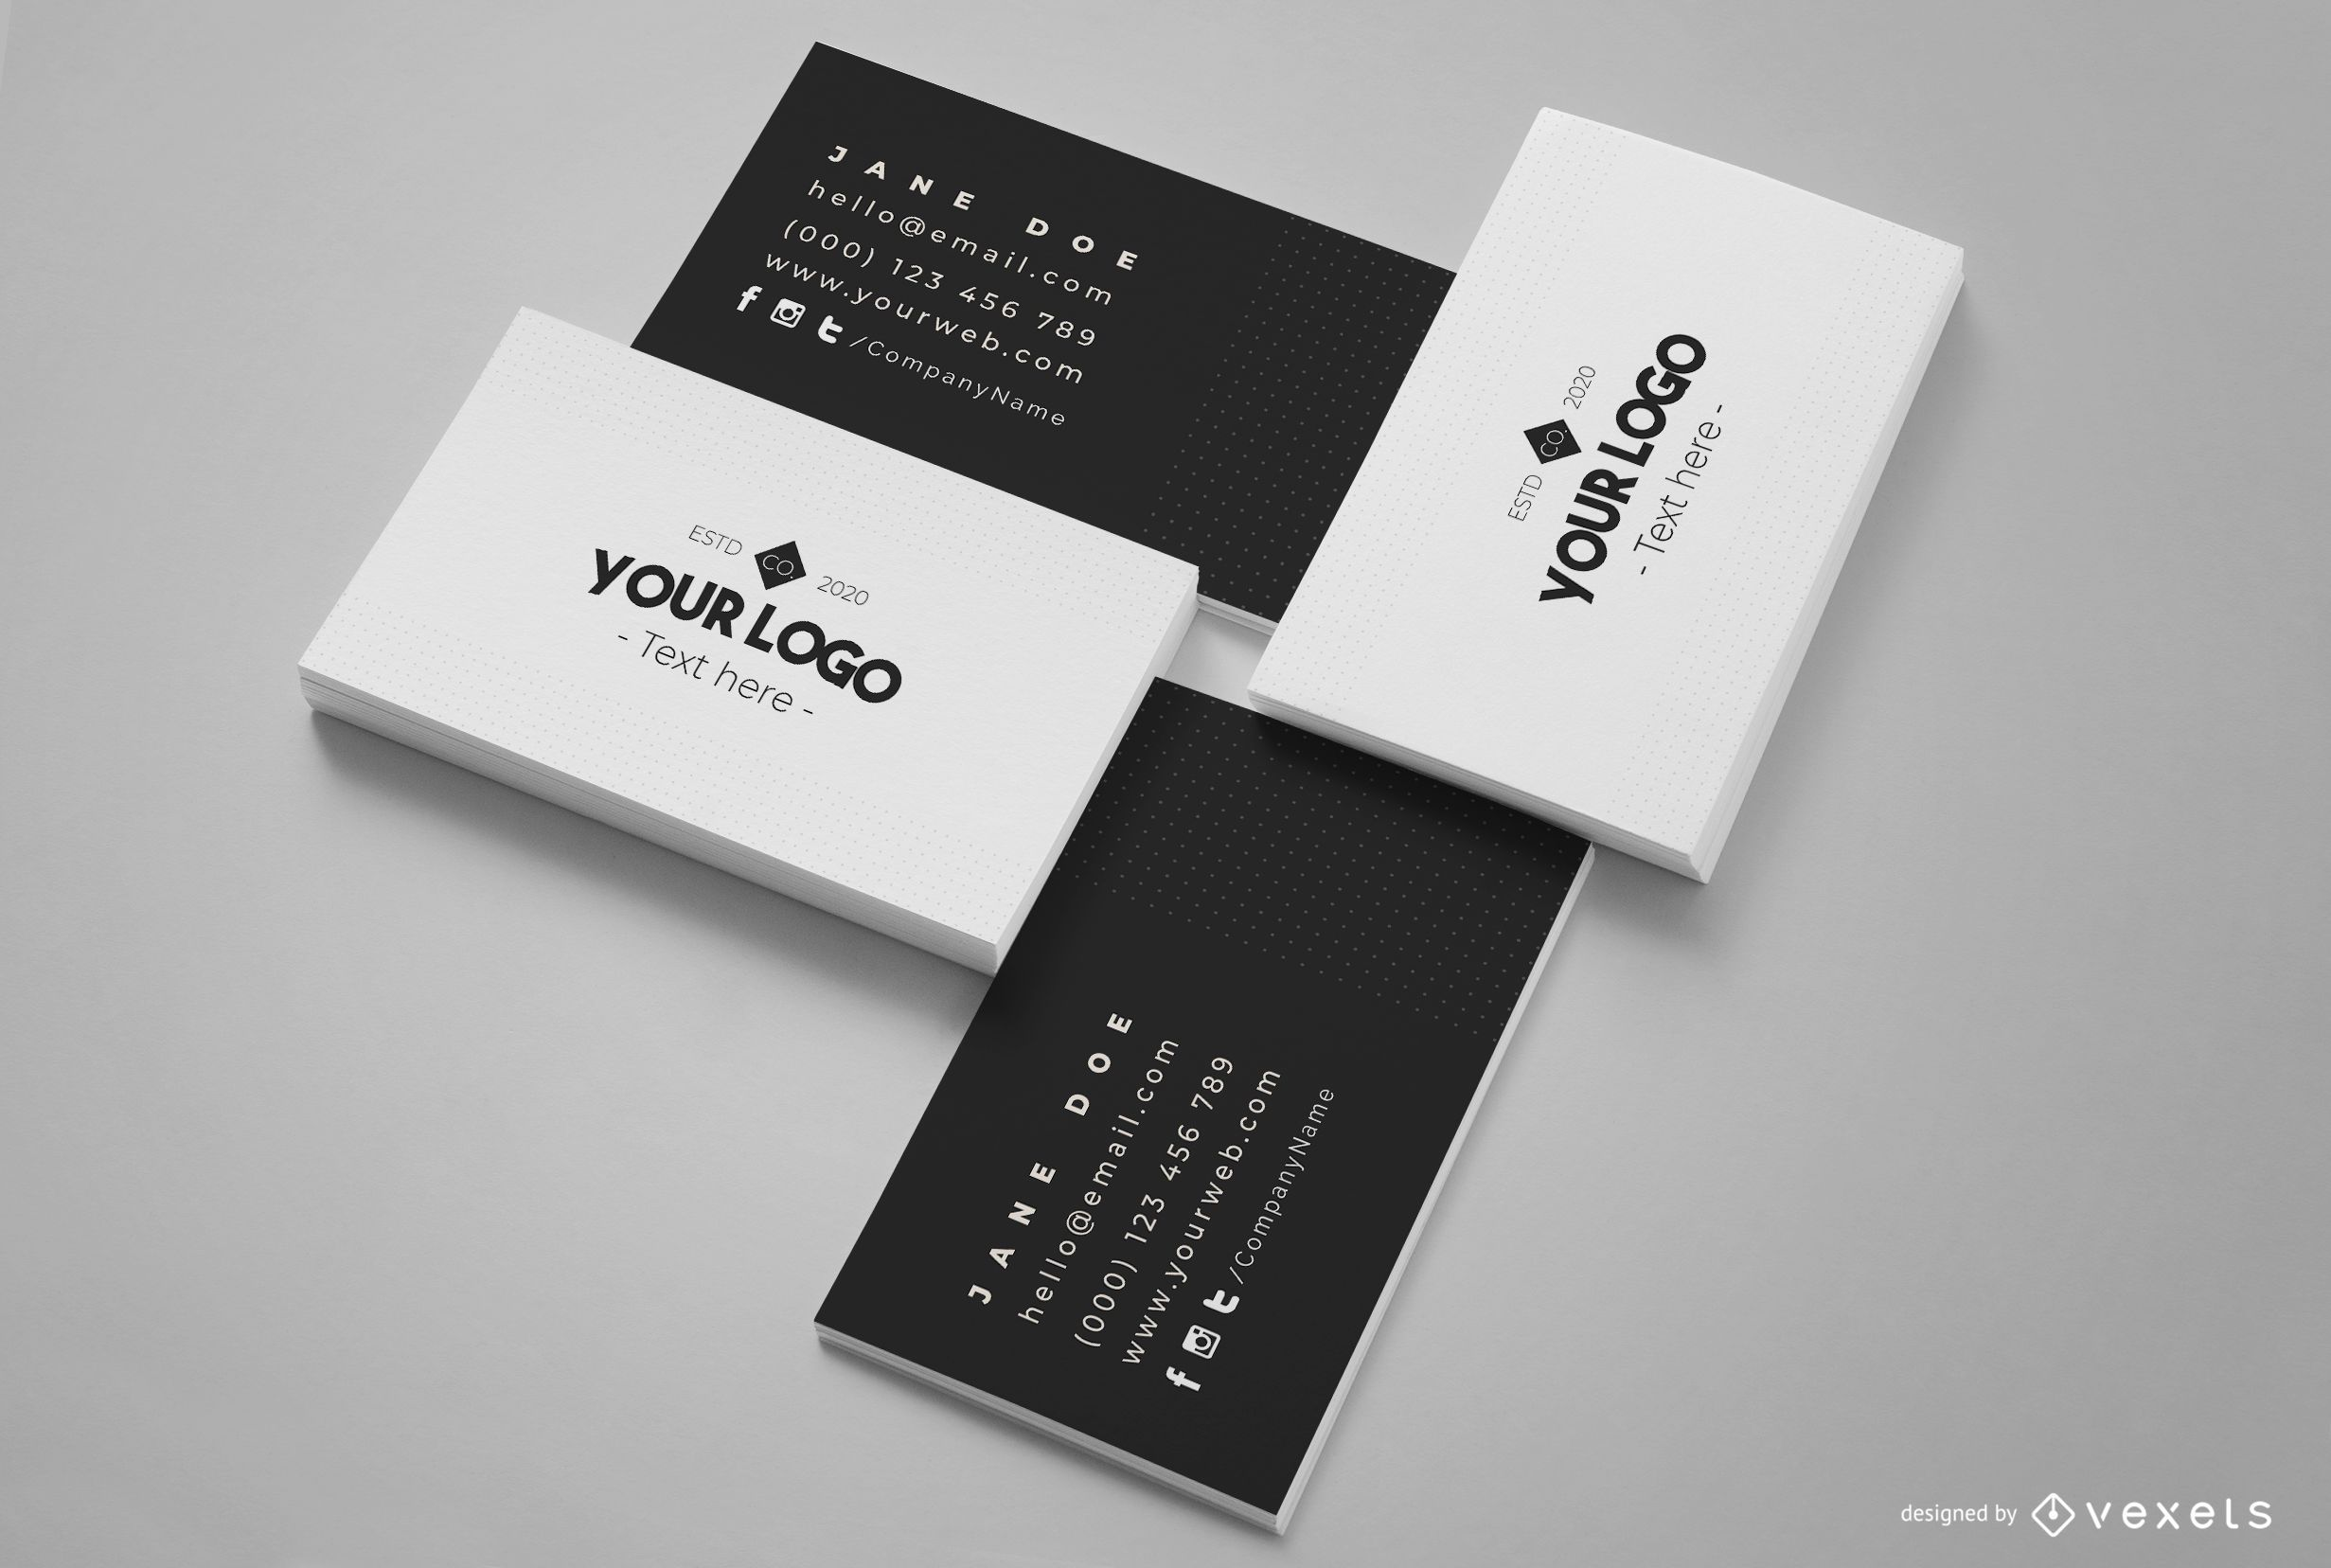 Maqueta de composici?n de tarjeta de visita